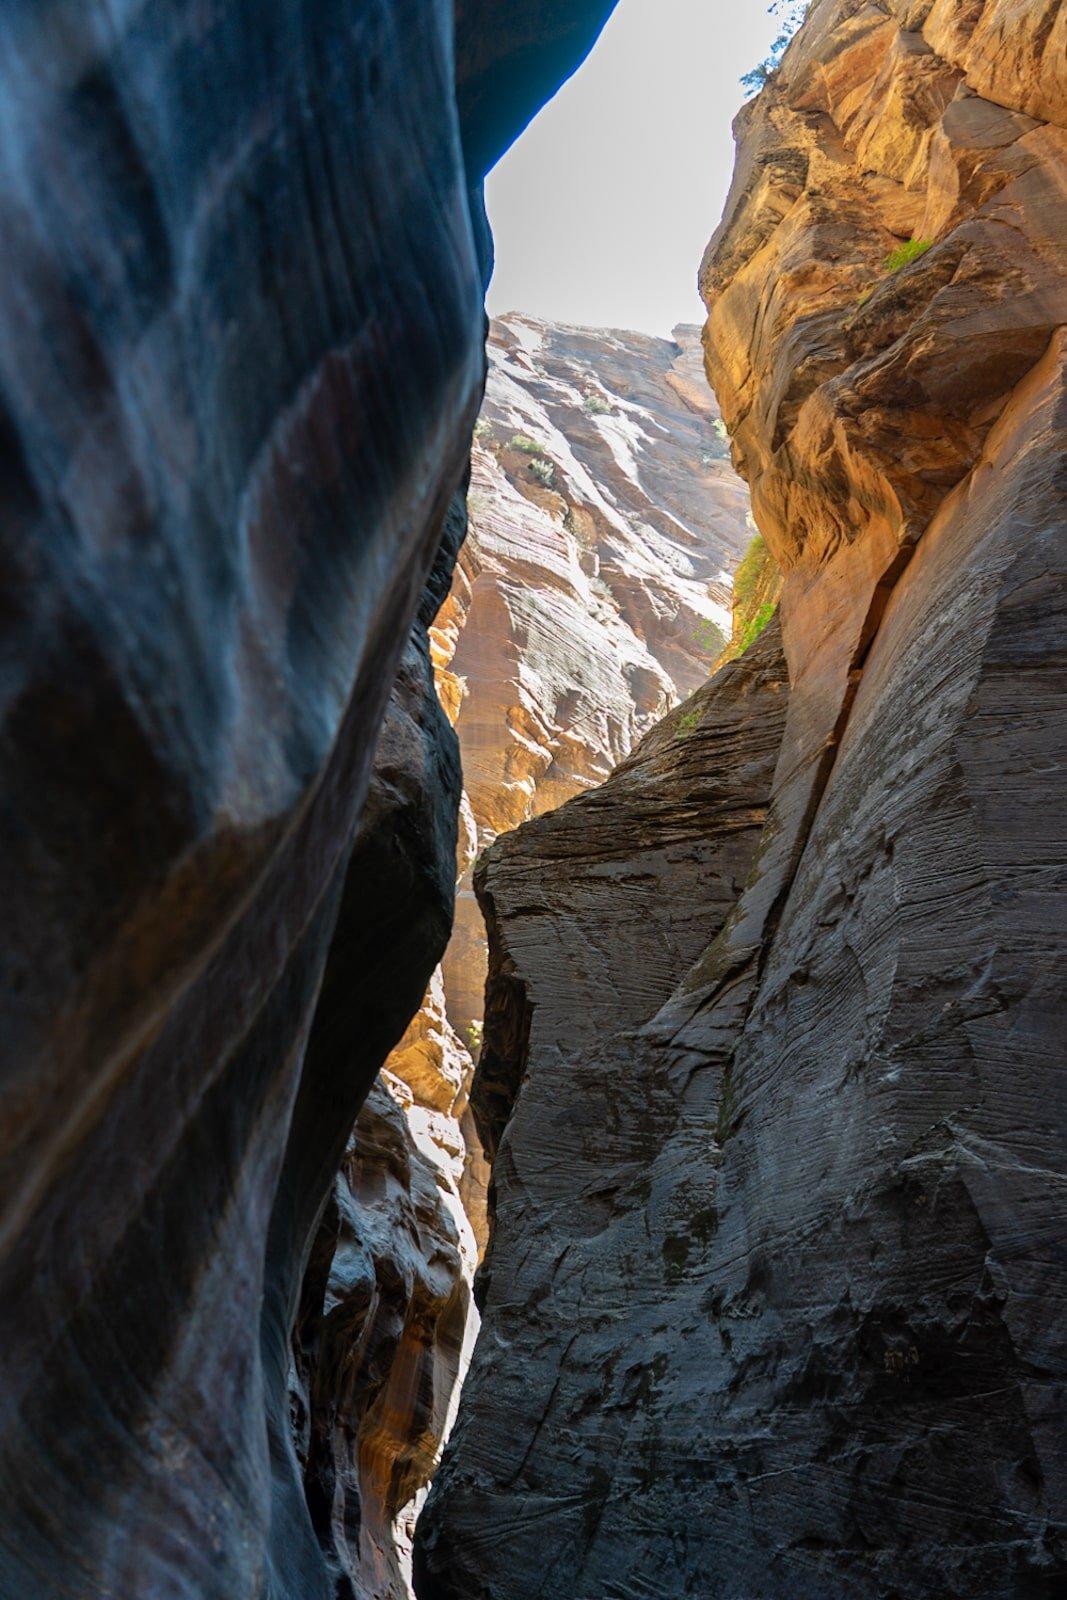 The beautiful Zion Narrows canyon walls